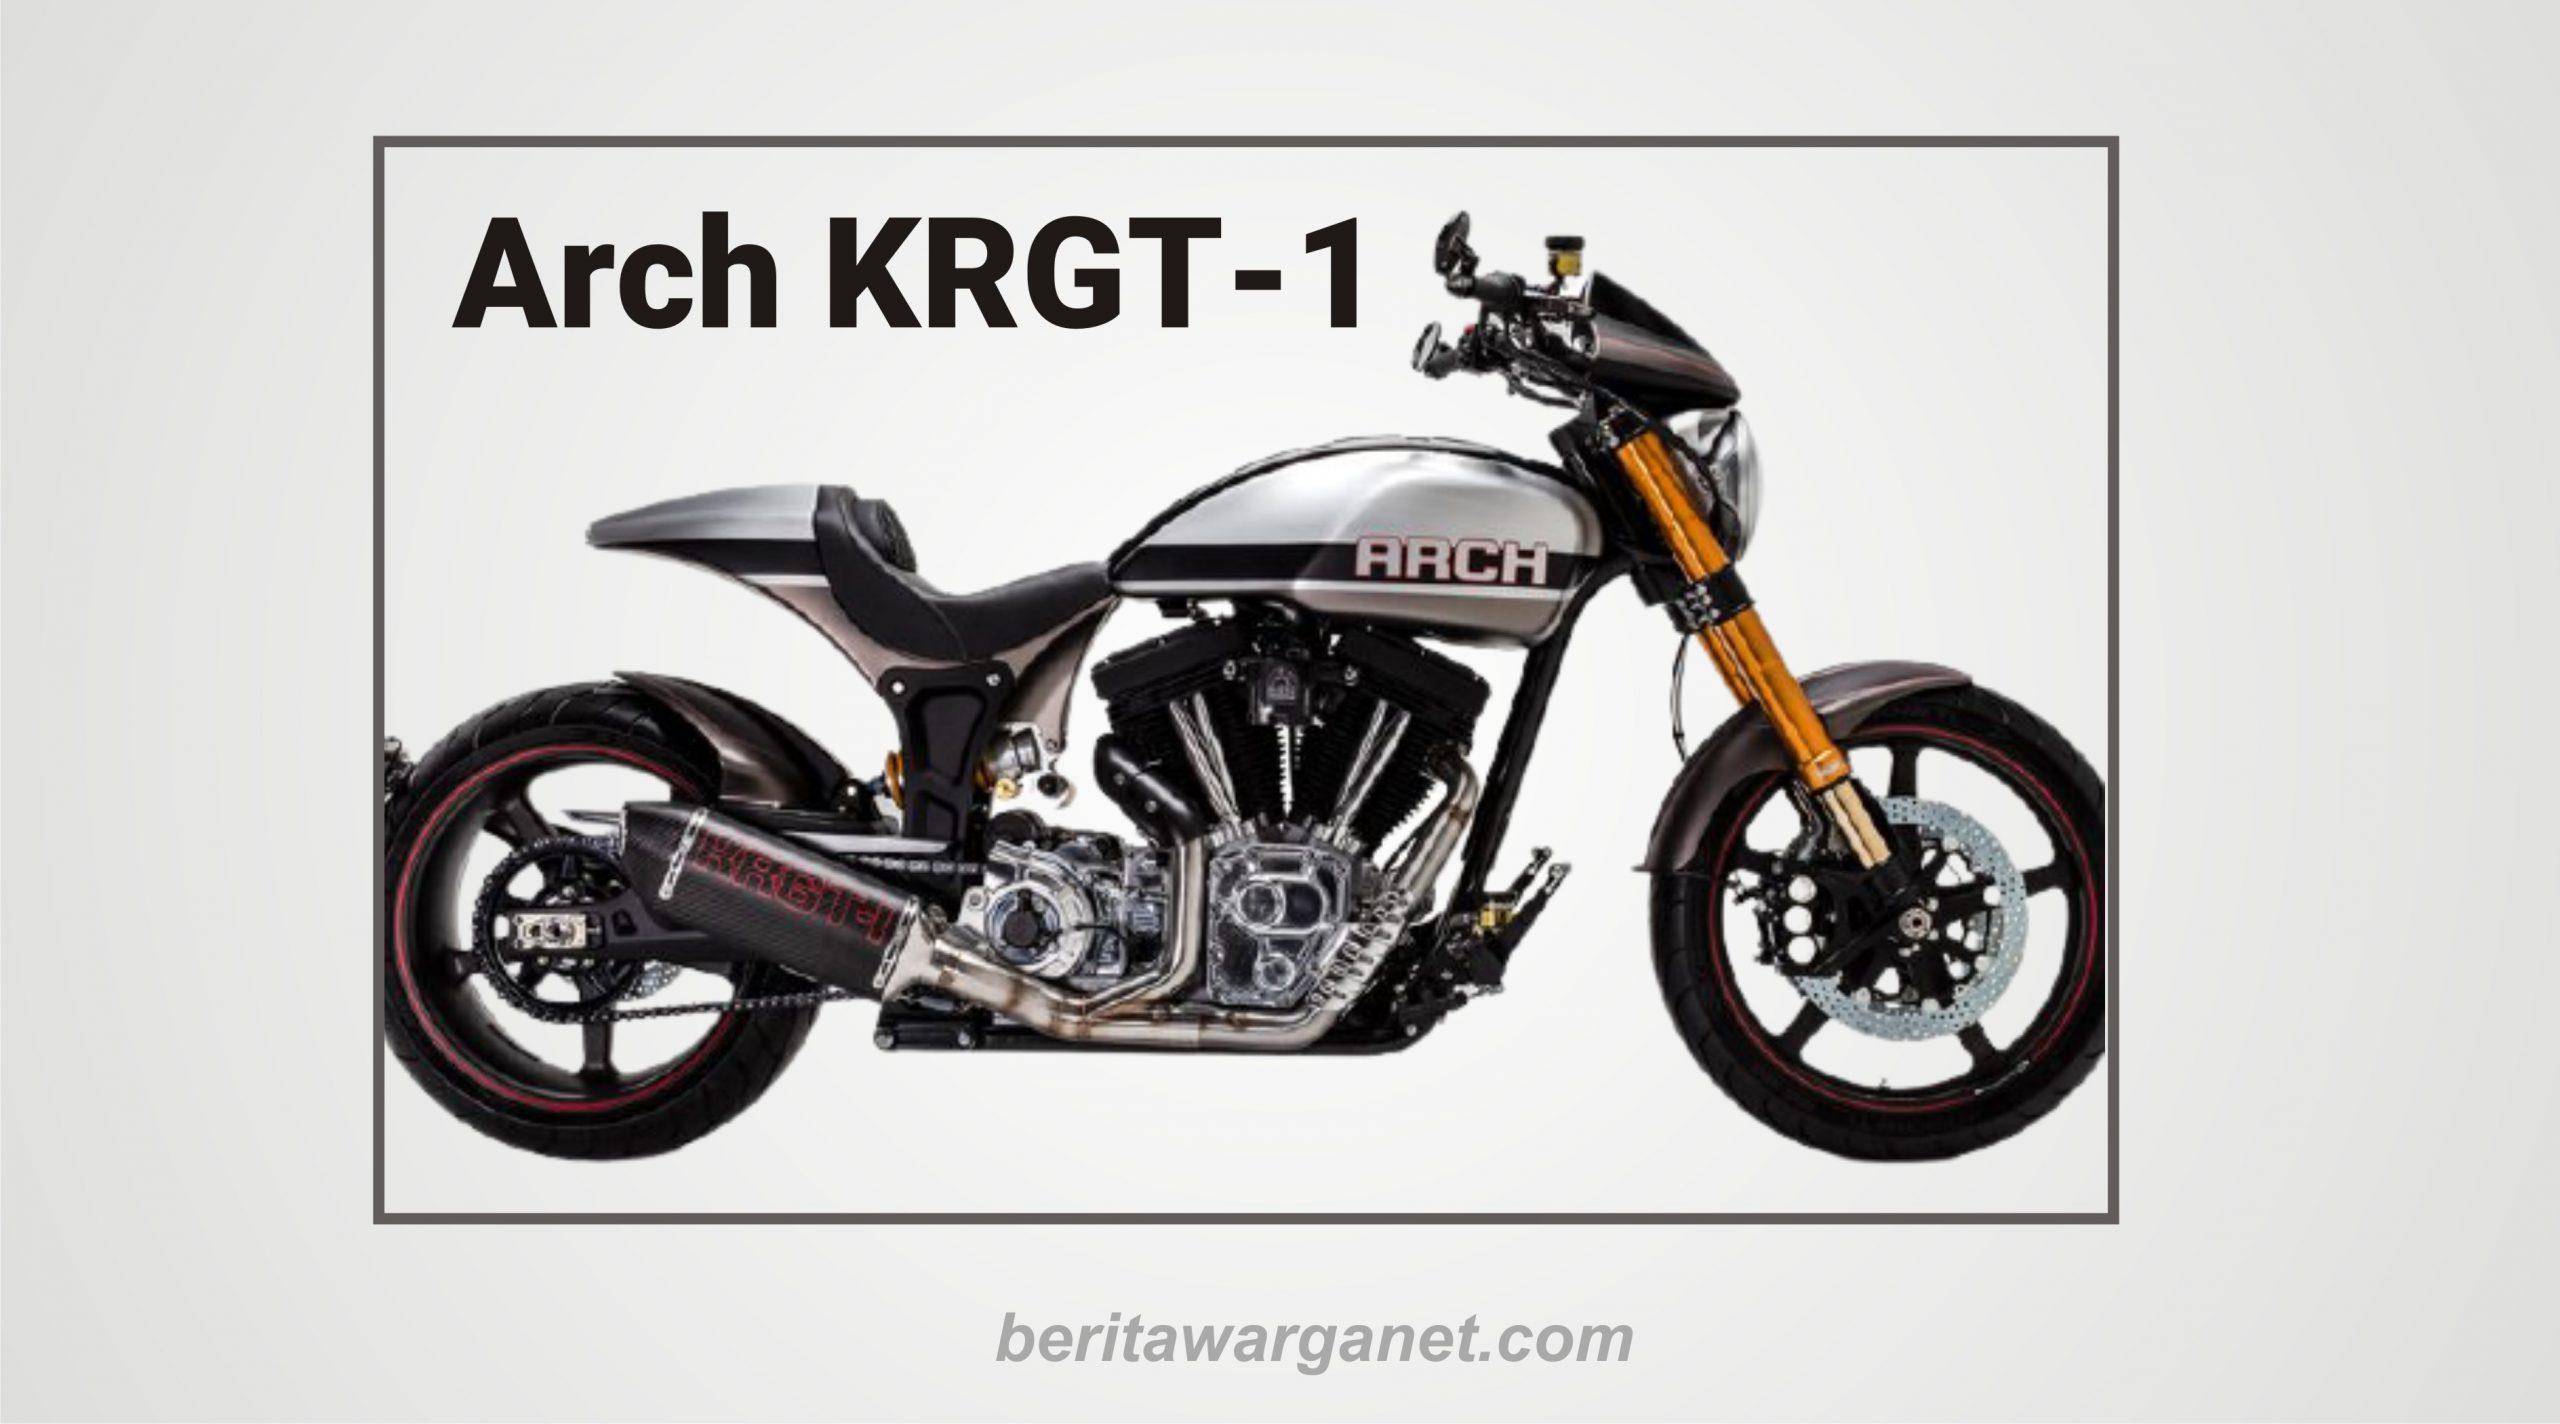 Arch KRGT-1